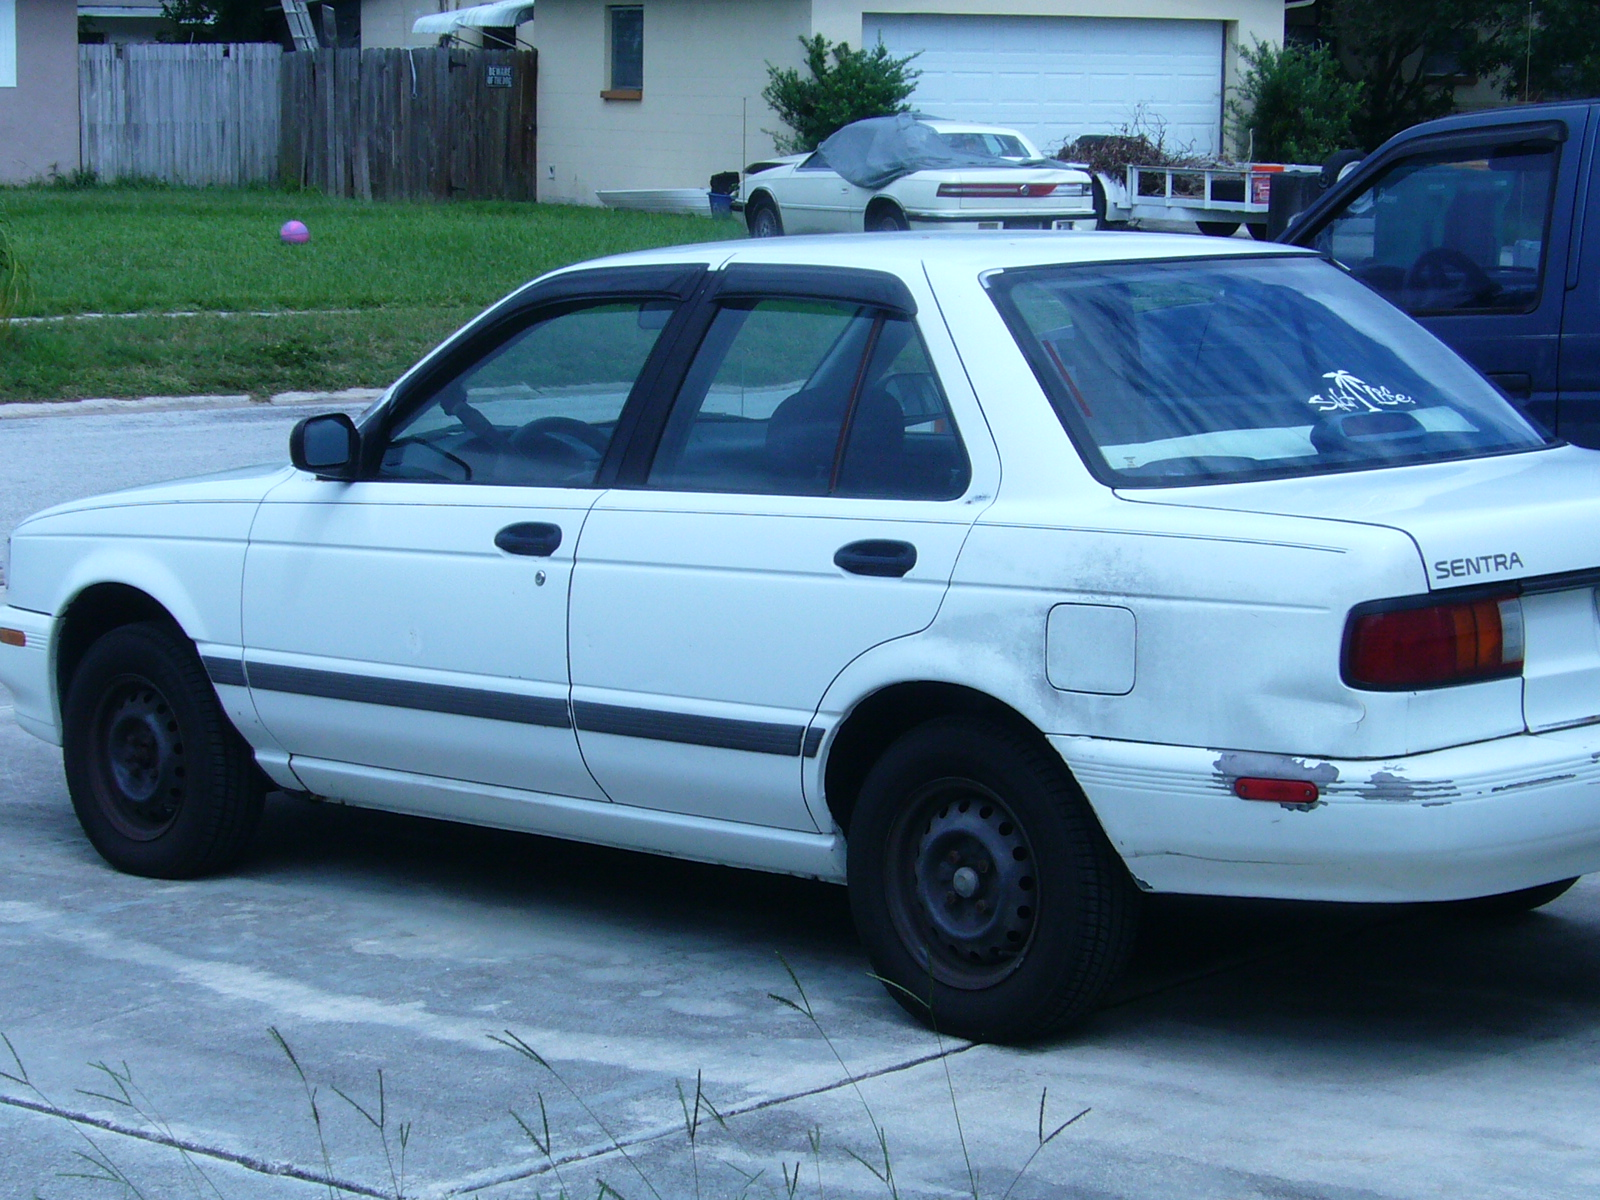 Nissan Sentra Xe Pic